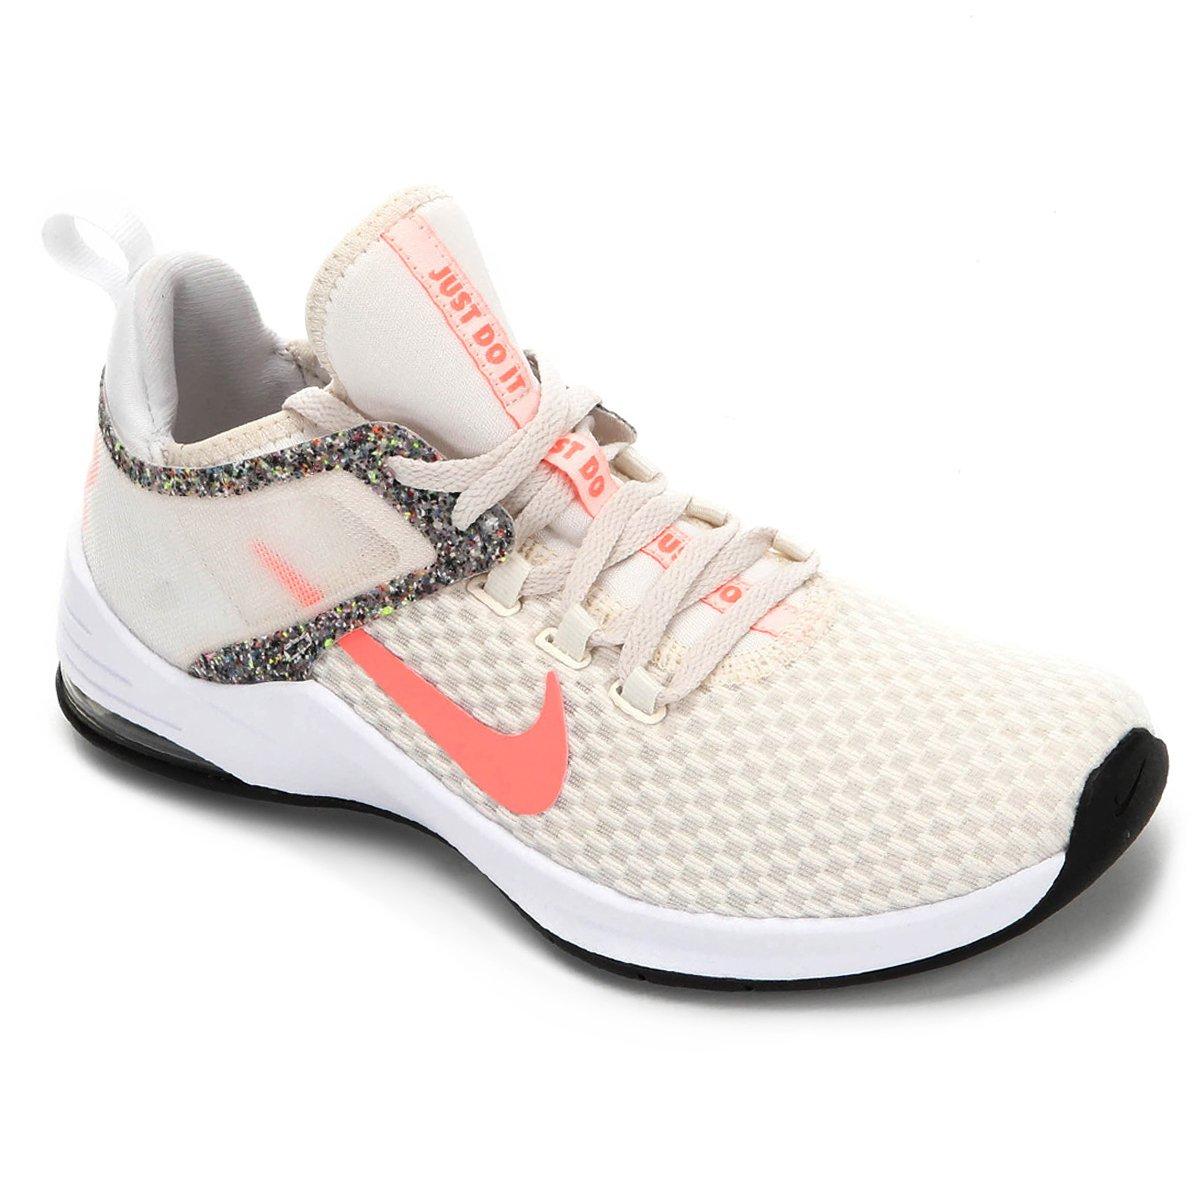 Tênis Nike Air Max Bella Tr 2 Feminino Branco E Preto